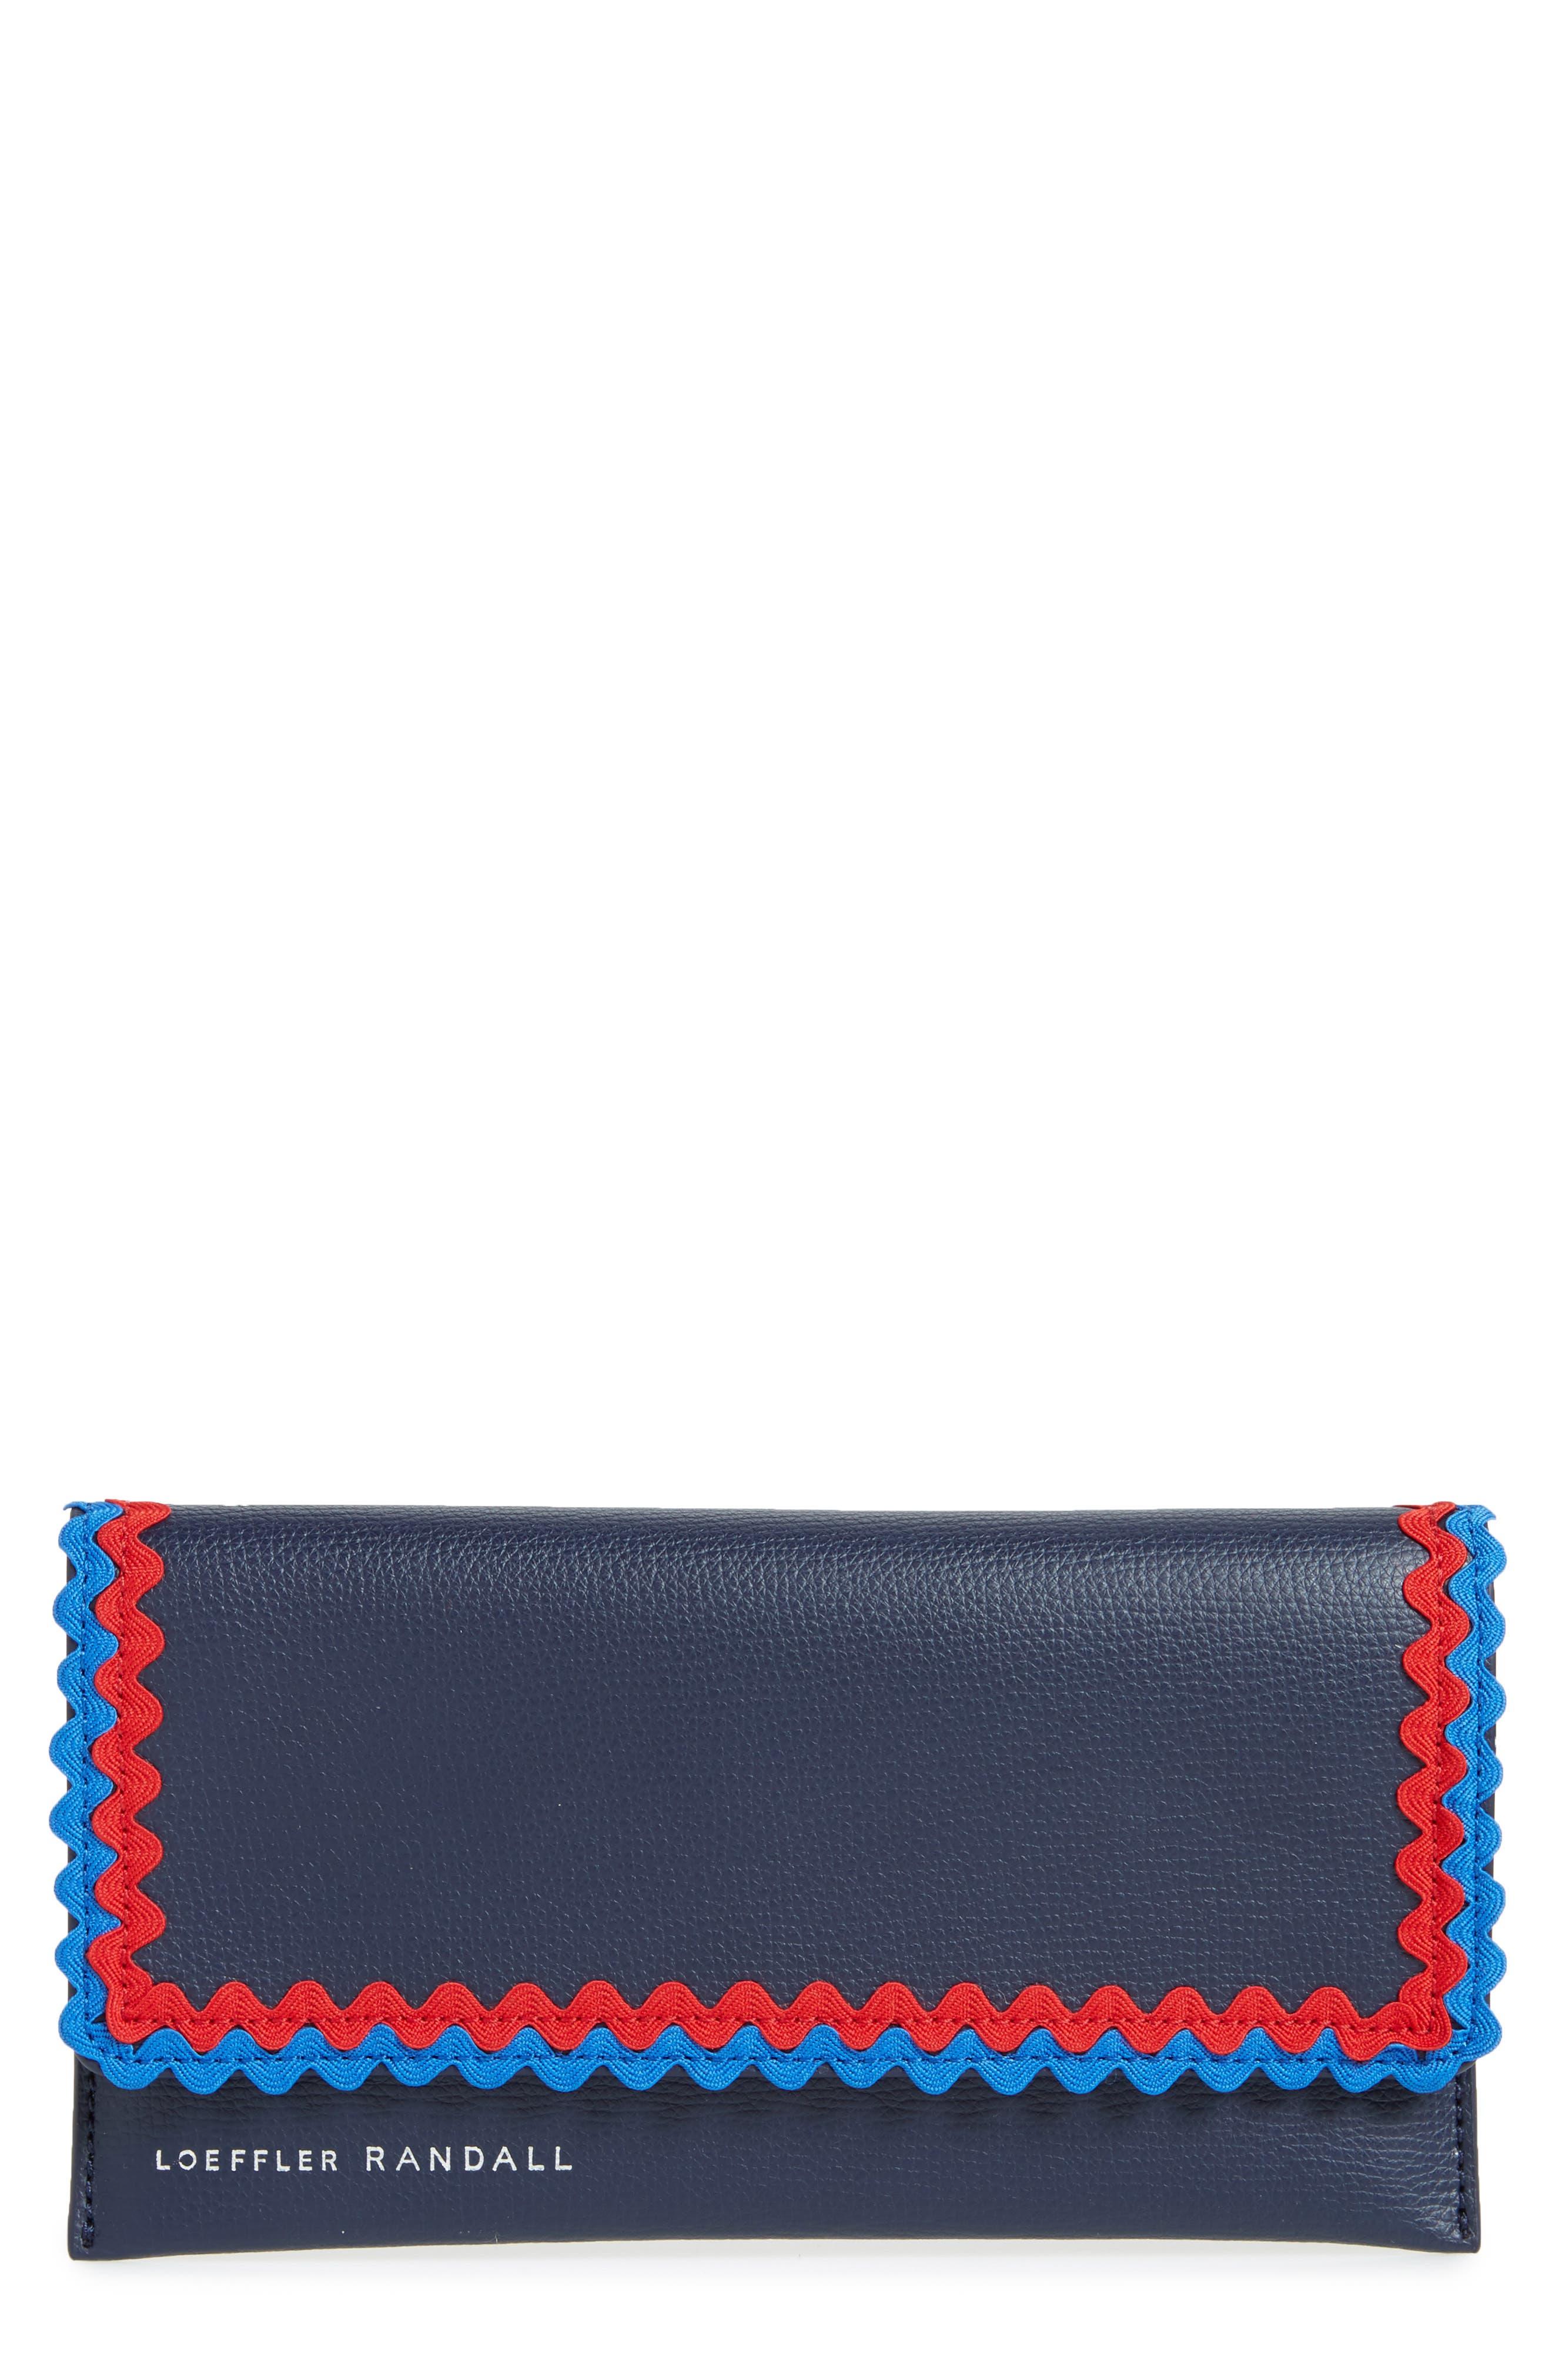 Alternate Image 1 Selected - Loeffler Randall Eveything Embellished Leather Wallet